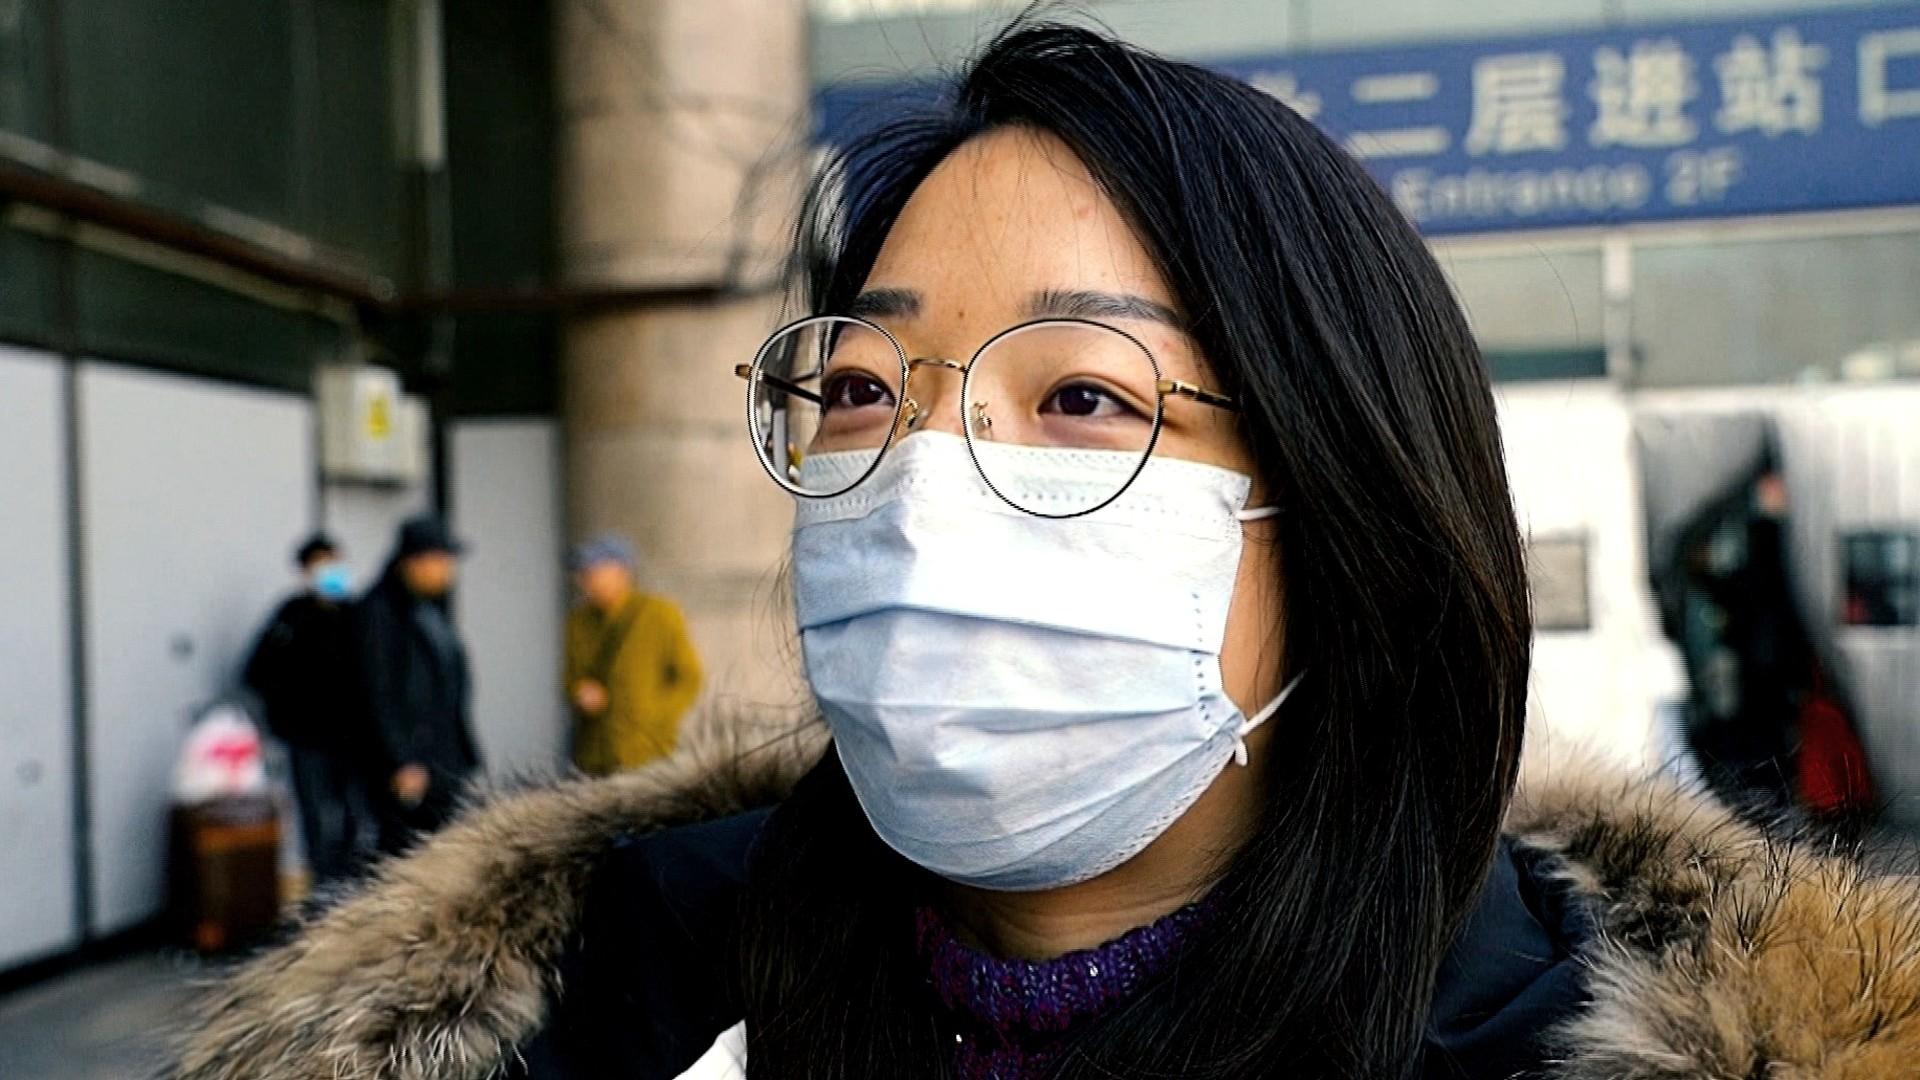 China coronavirus: Two deaths reported outside Hubei